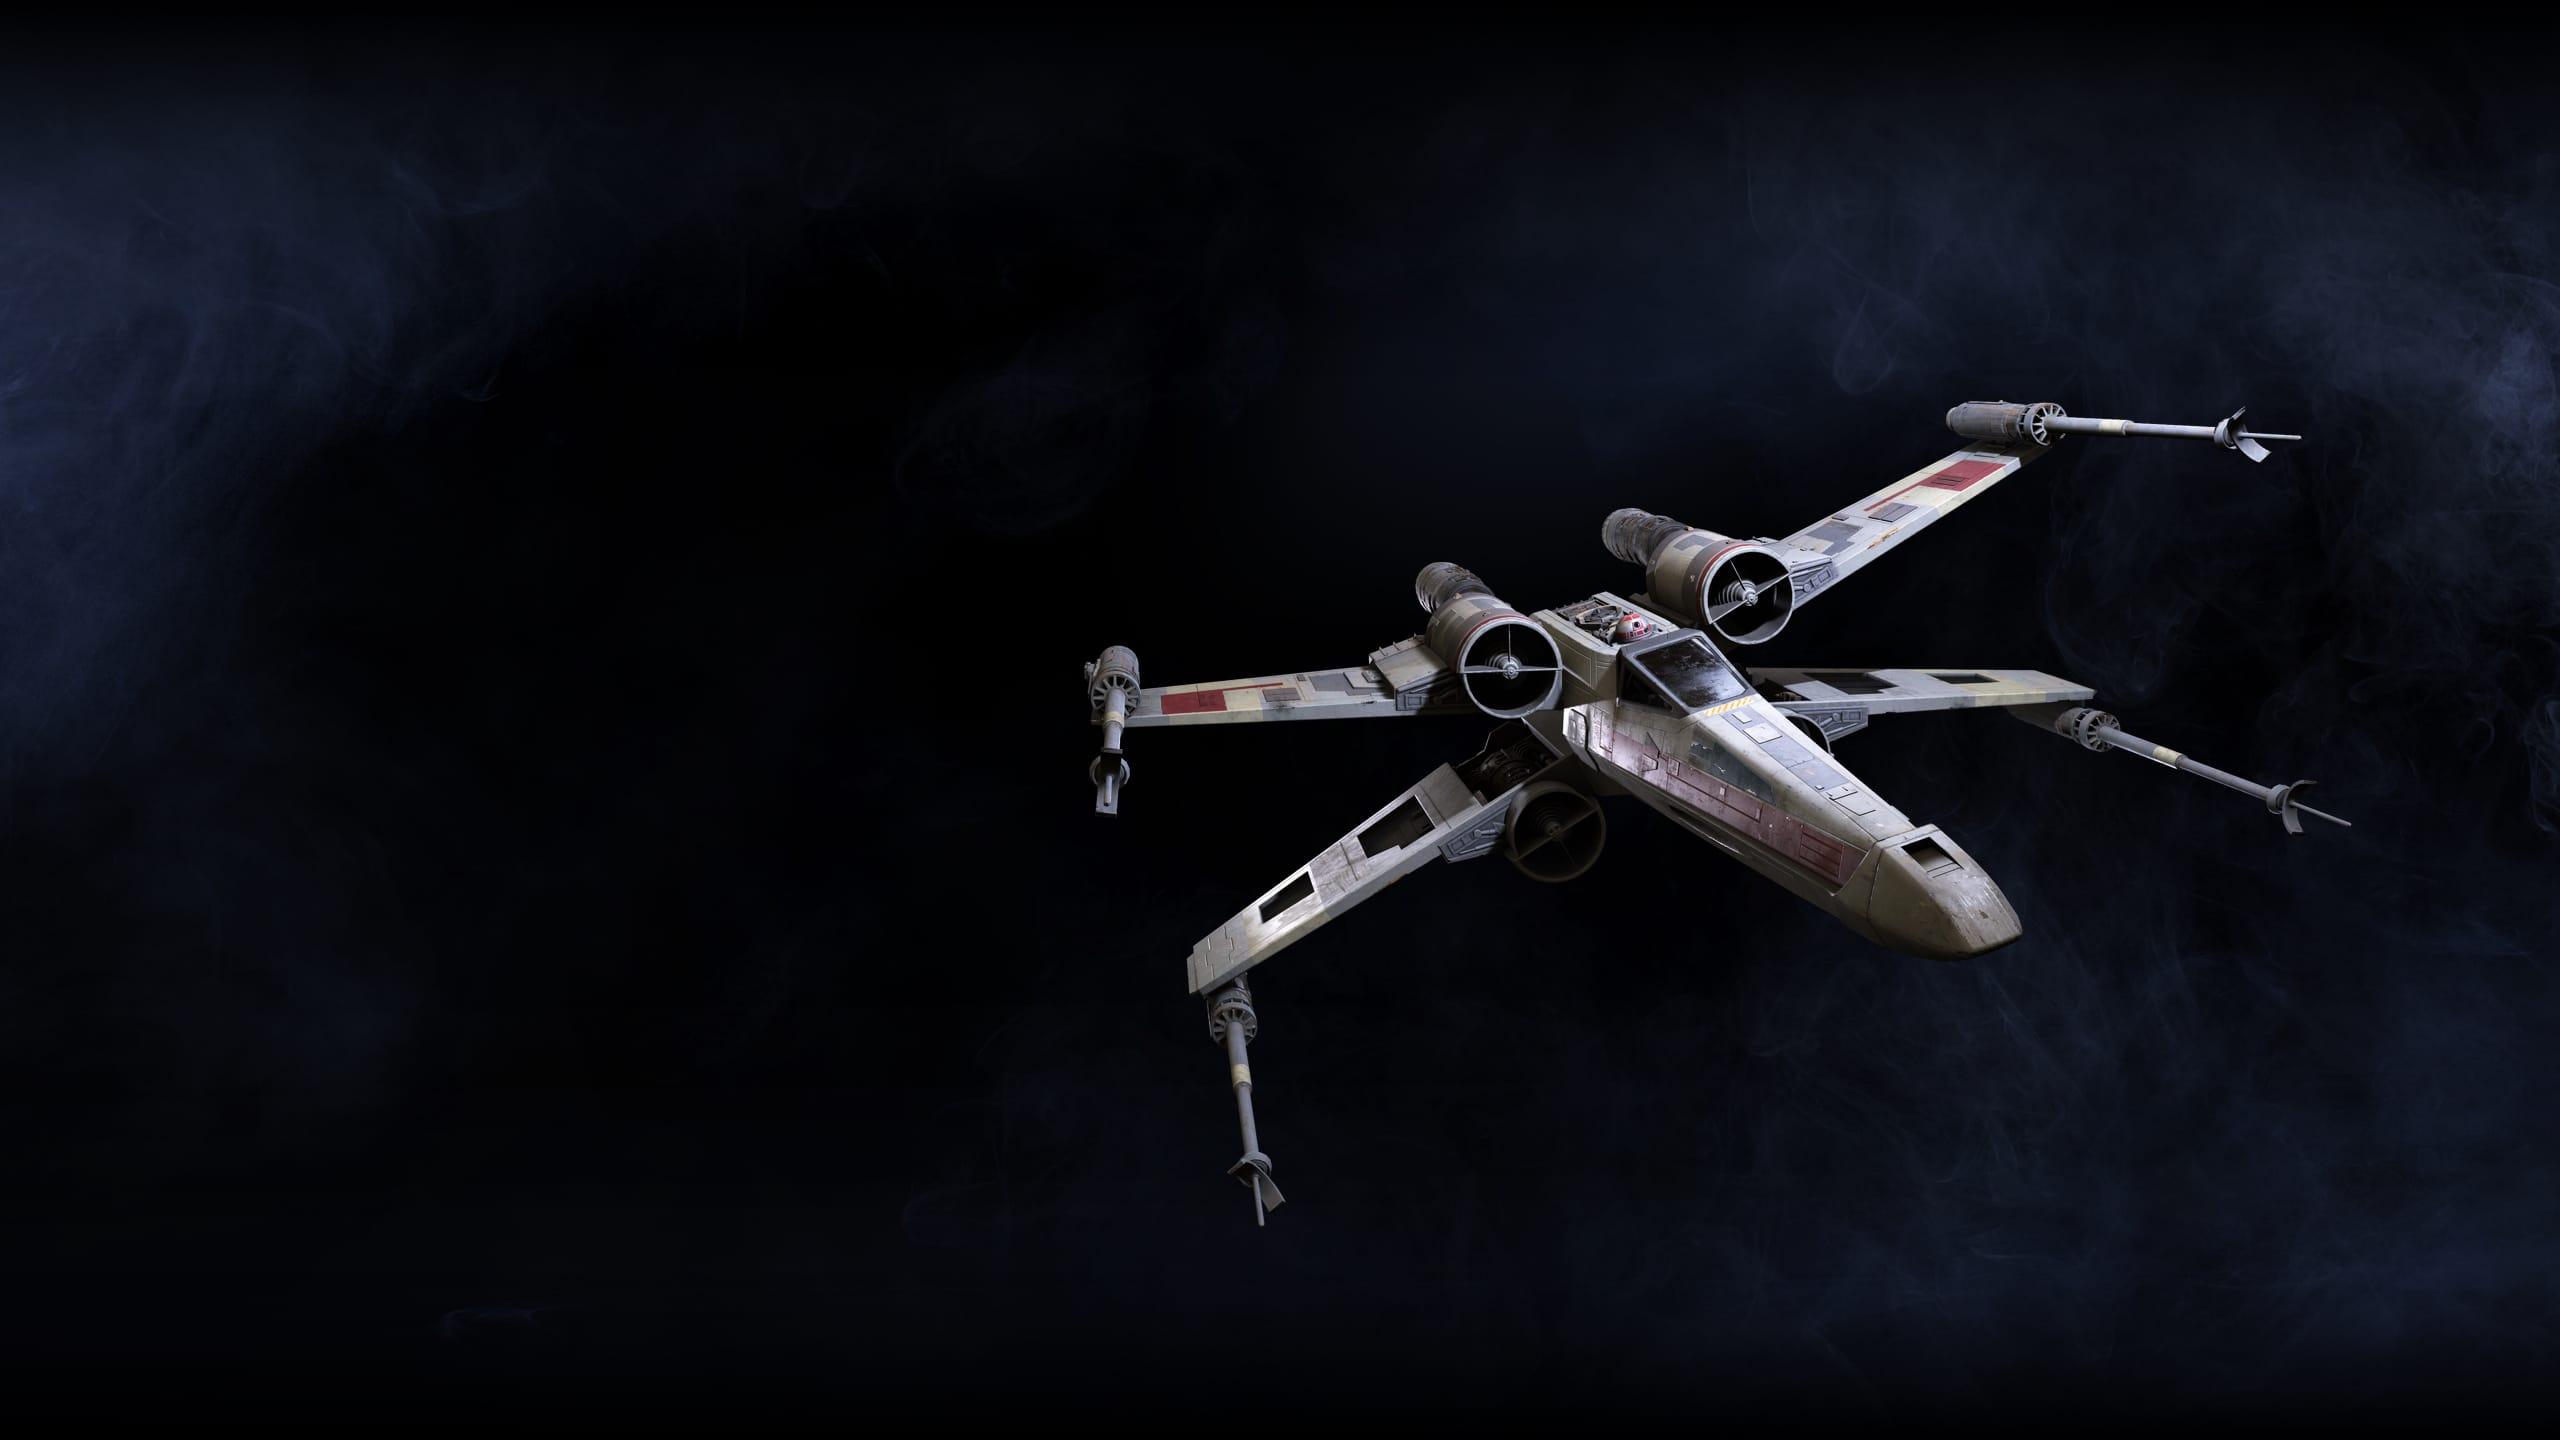 star wars battlefront 2 le vaisseau chasseur x wing. Black Bedroom Furniture Sets. Home Design Ideas